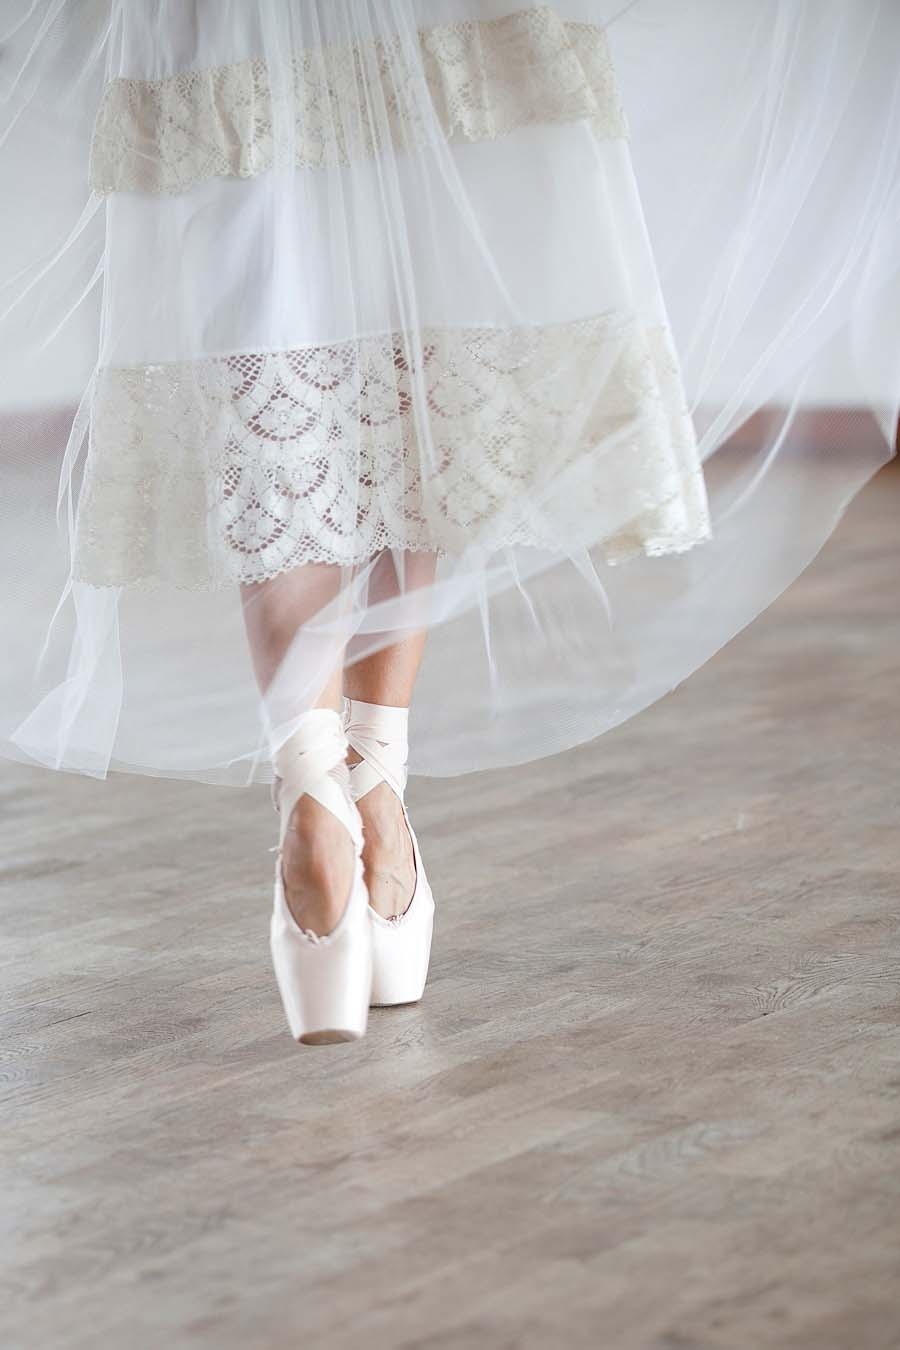 eco ballerina bridal an eco wedding editorial to inspire ethically conscious brides. Black Bedroom Furniture Sets. Home Design Ideas